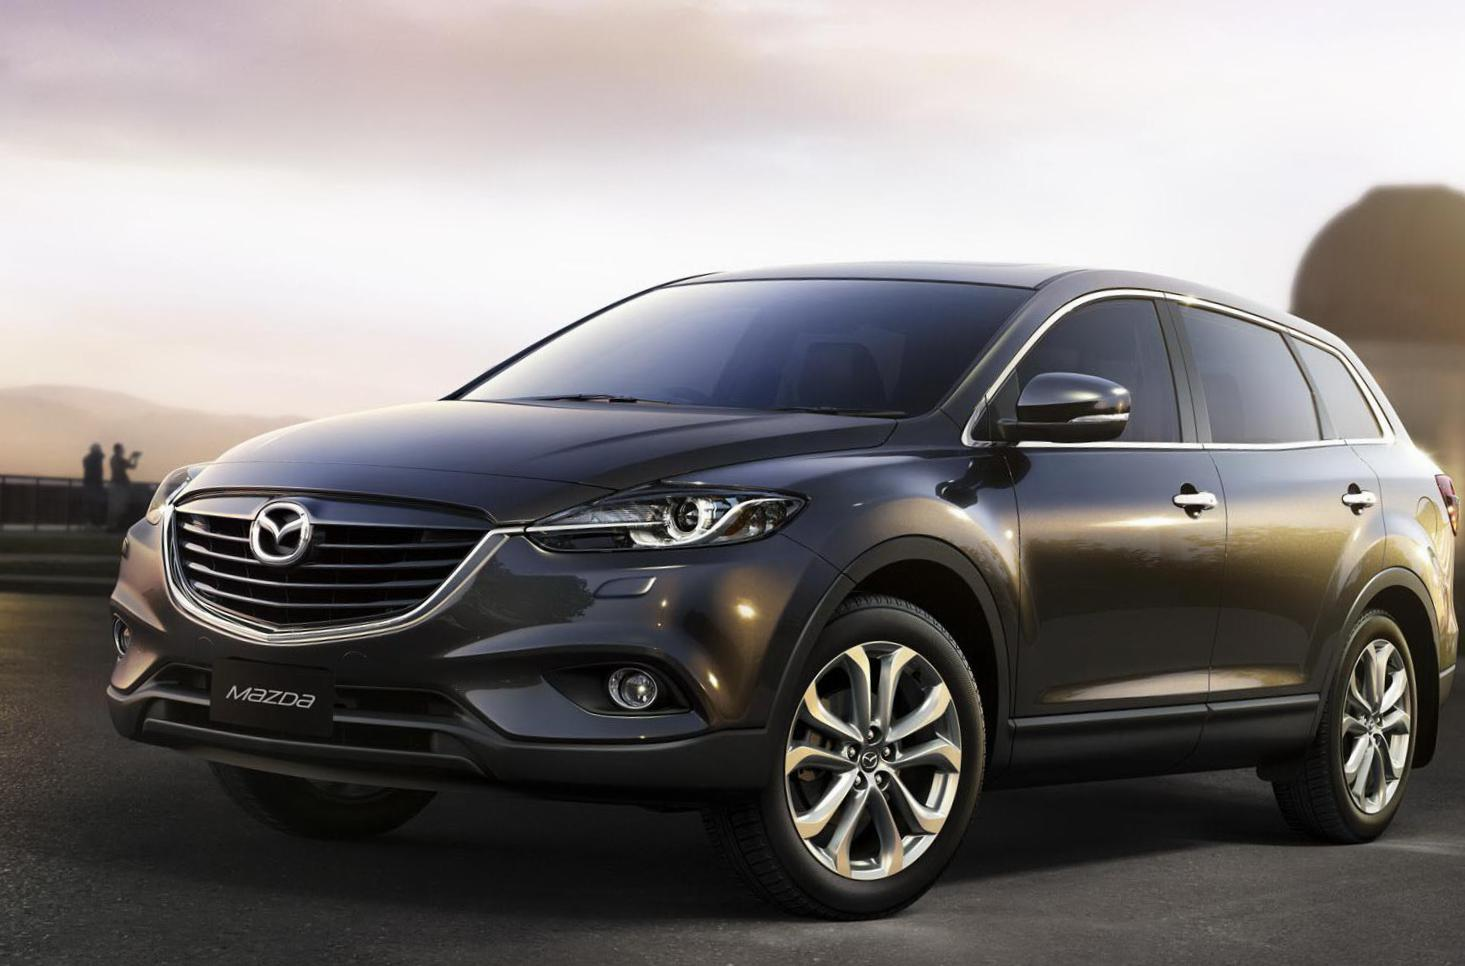 CX 9 Mazda Specifications 2015